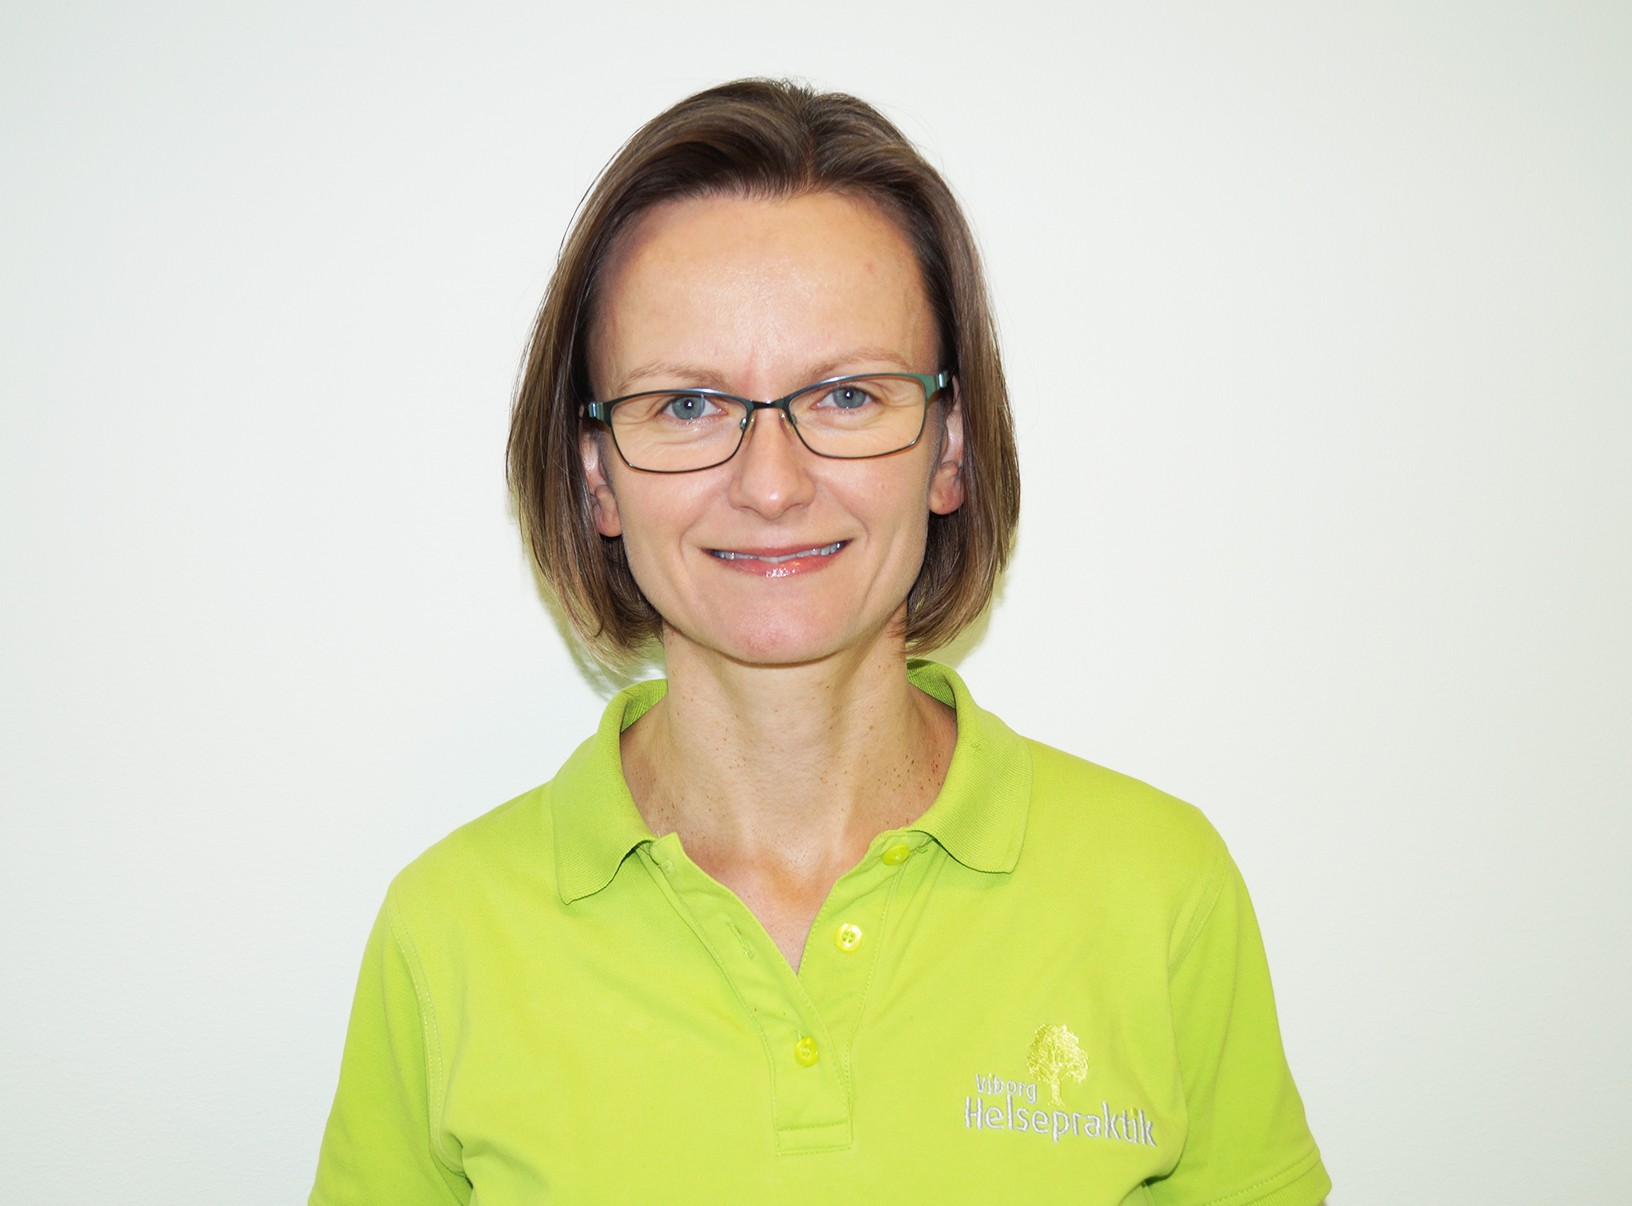 Janne er behandler og underviser hos Viborg Helsepraktik